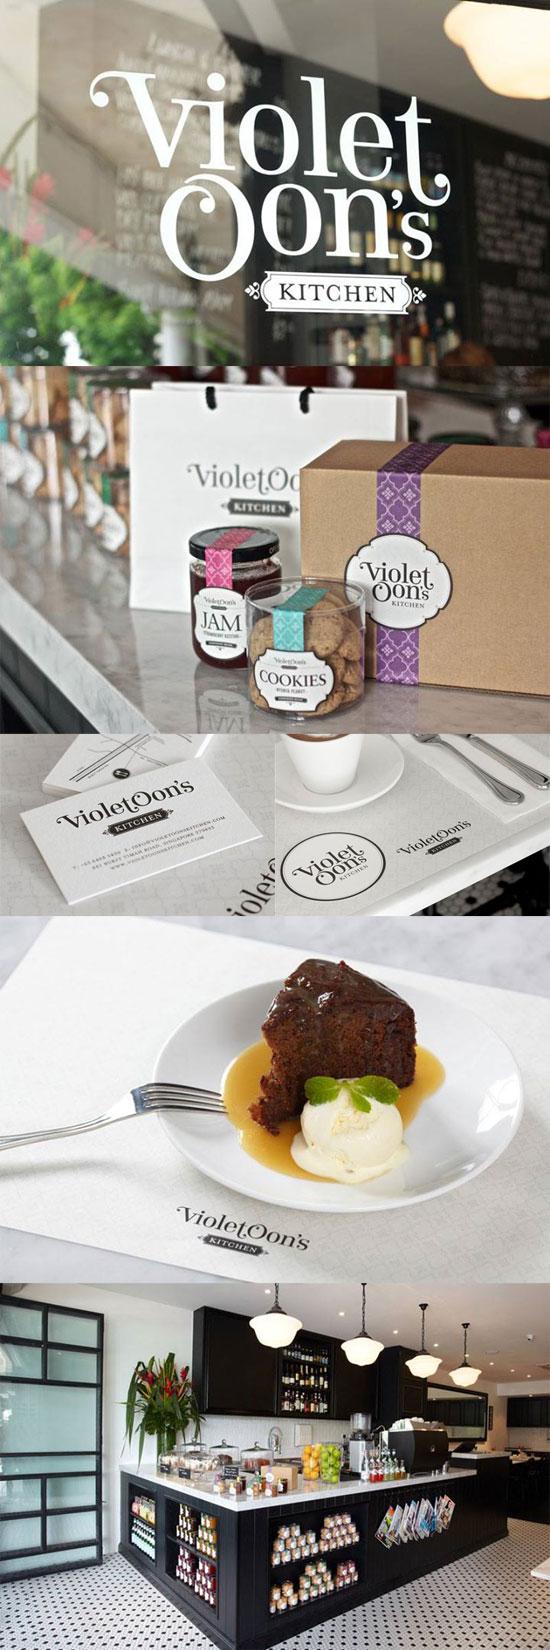 55 brand identity design examples for restaurant